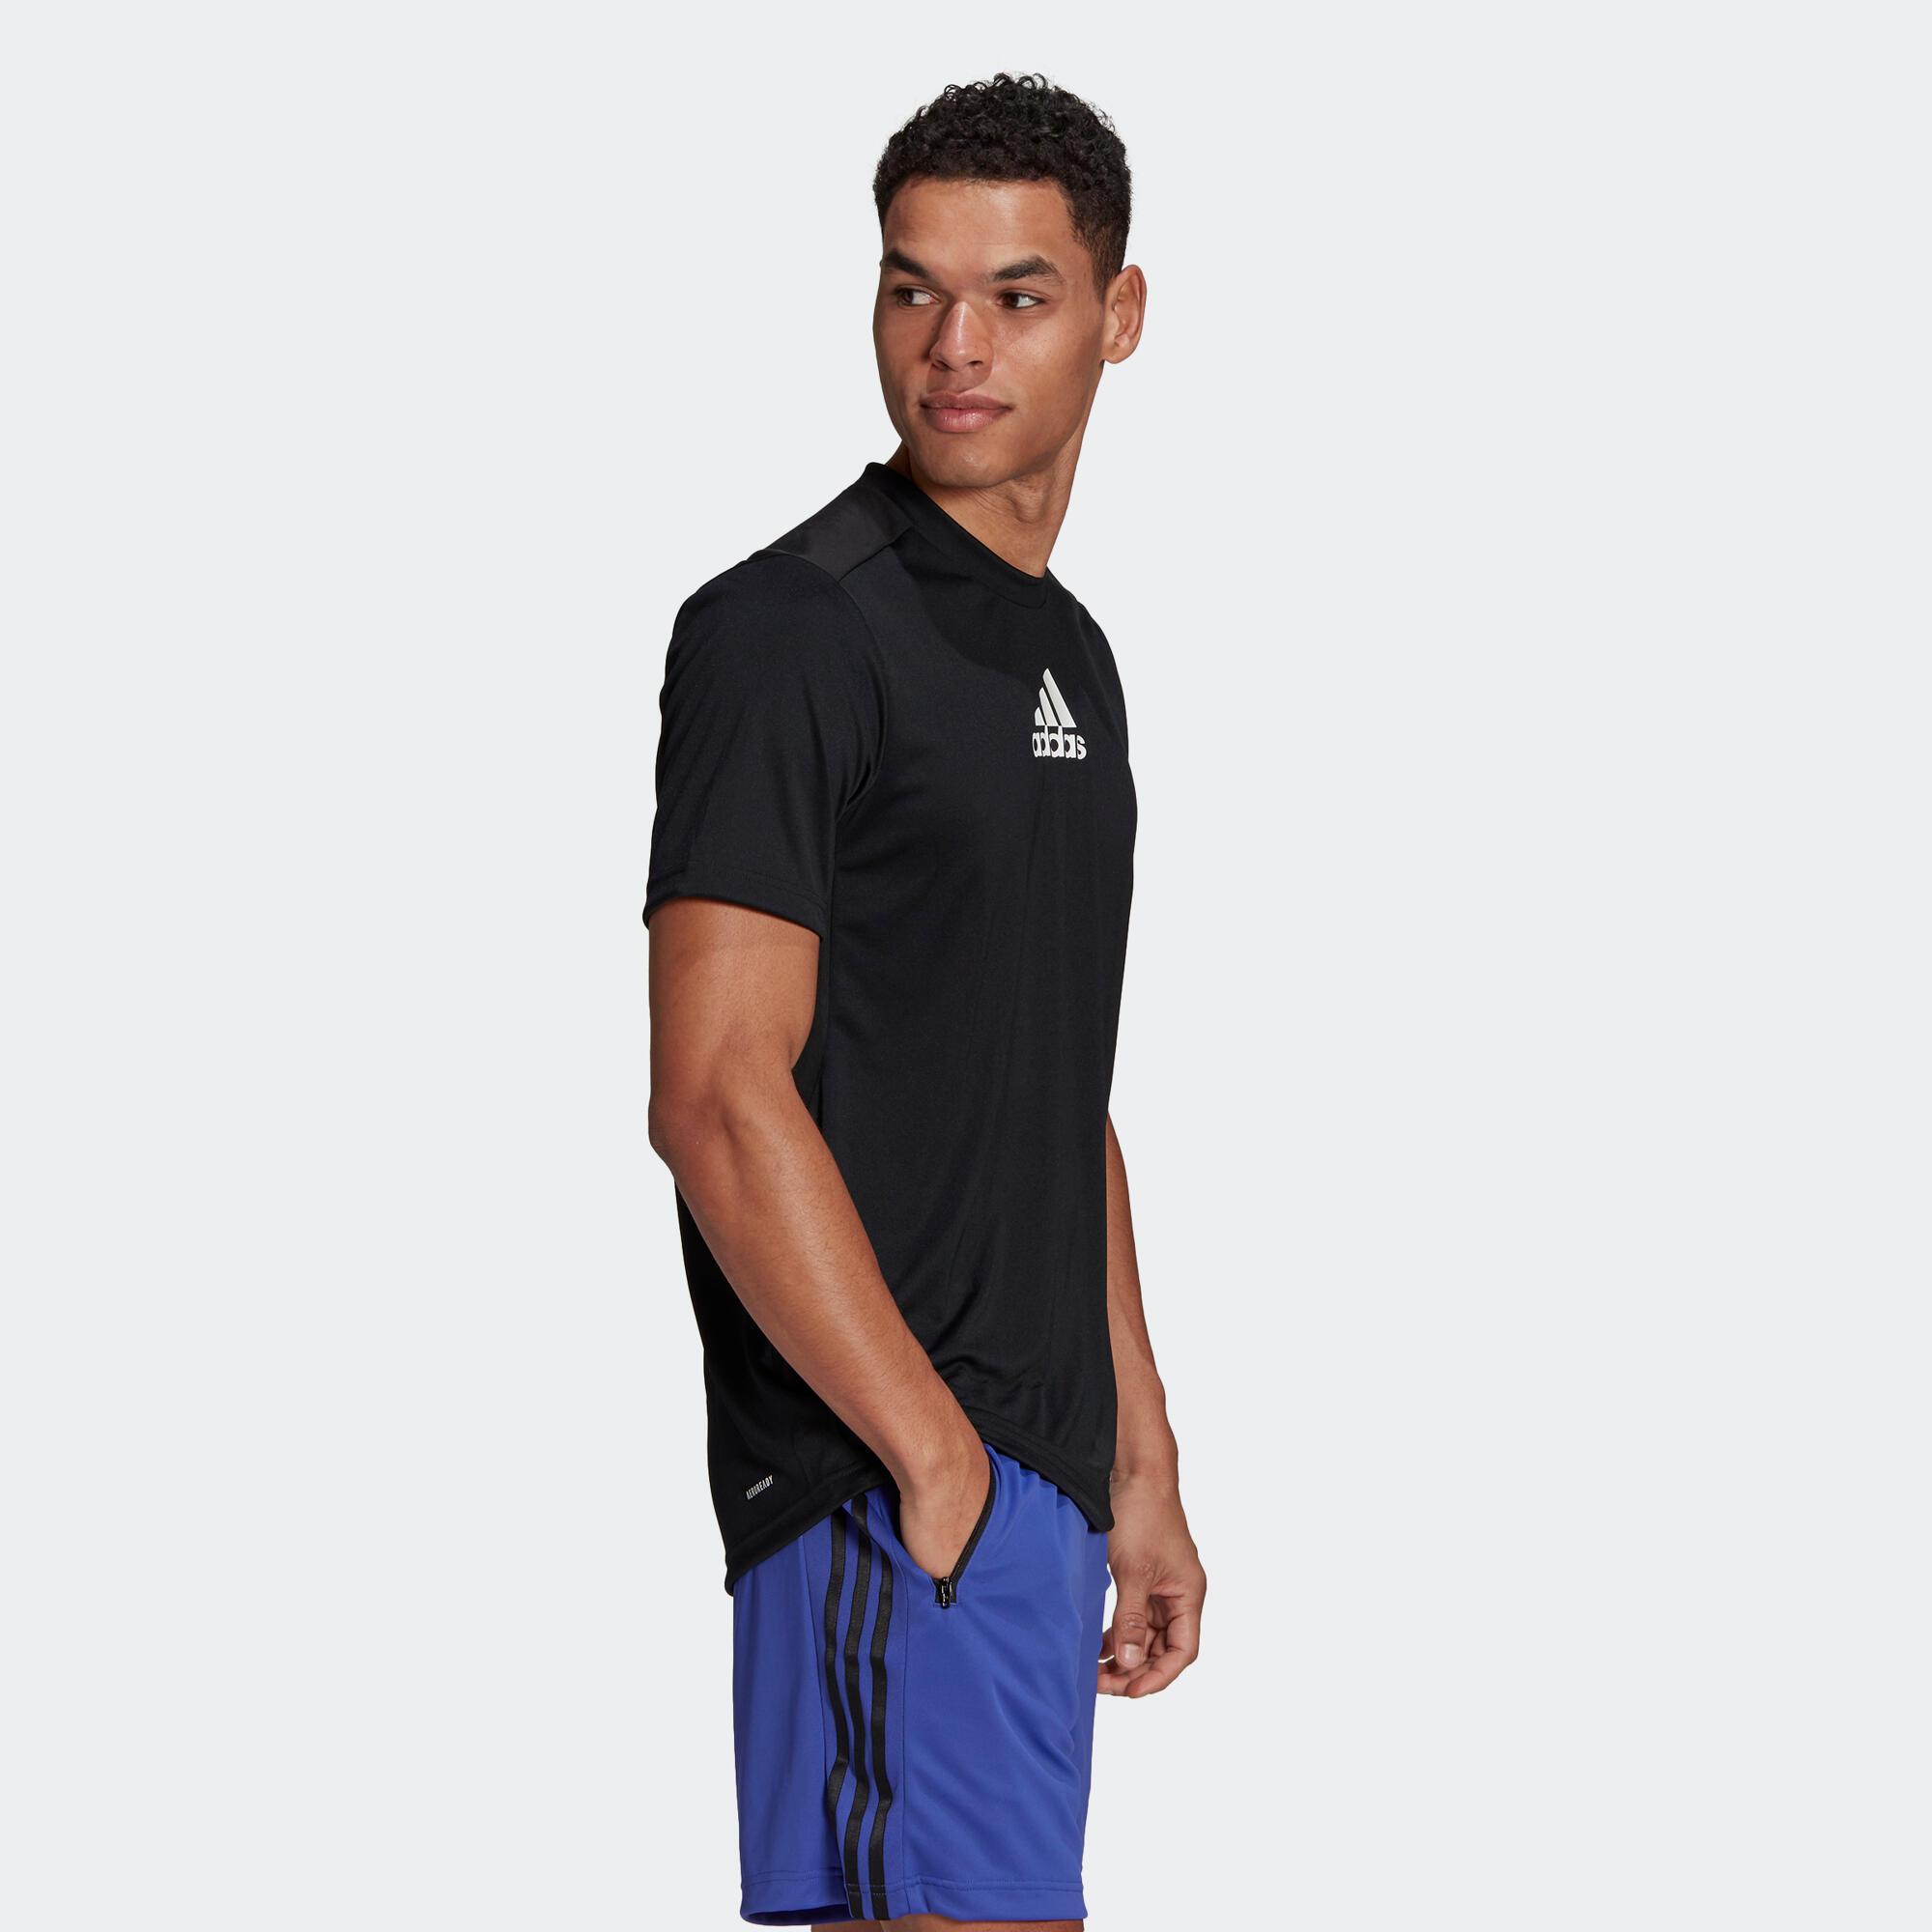 Tricou ADIDAS Fitness Bărbați imagine